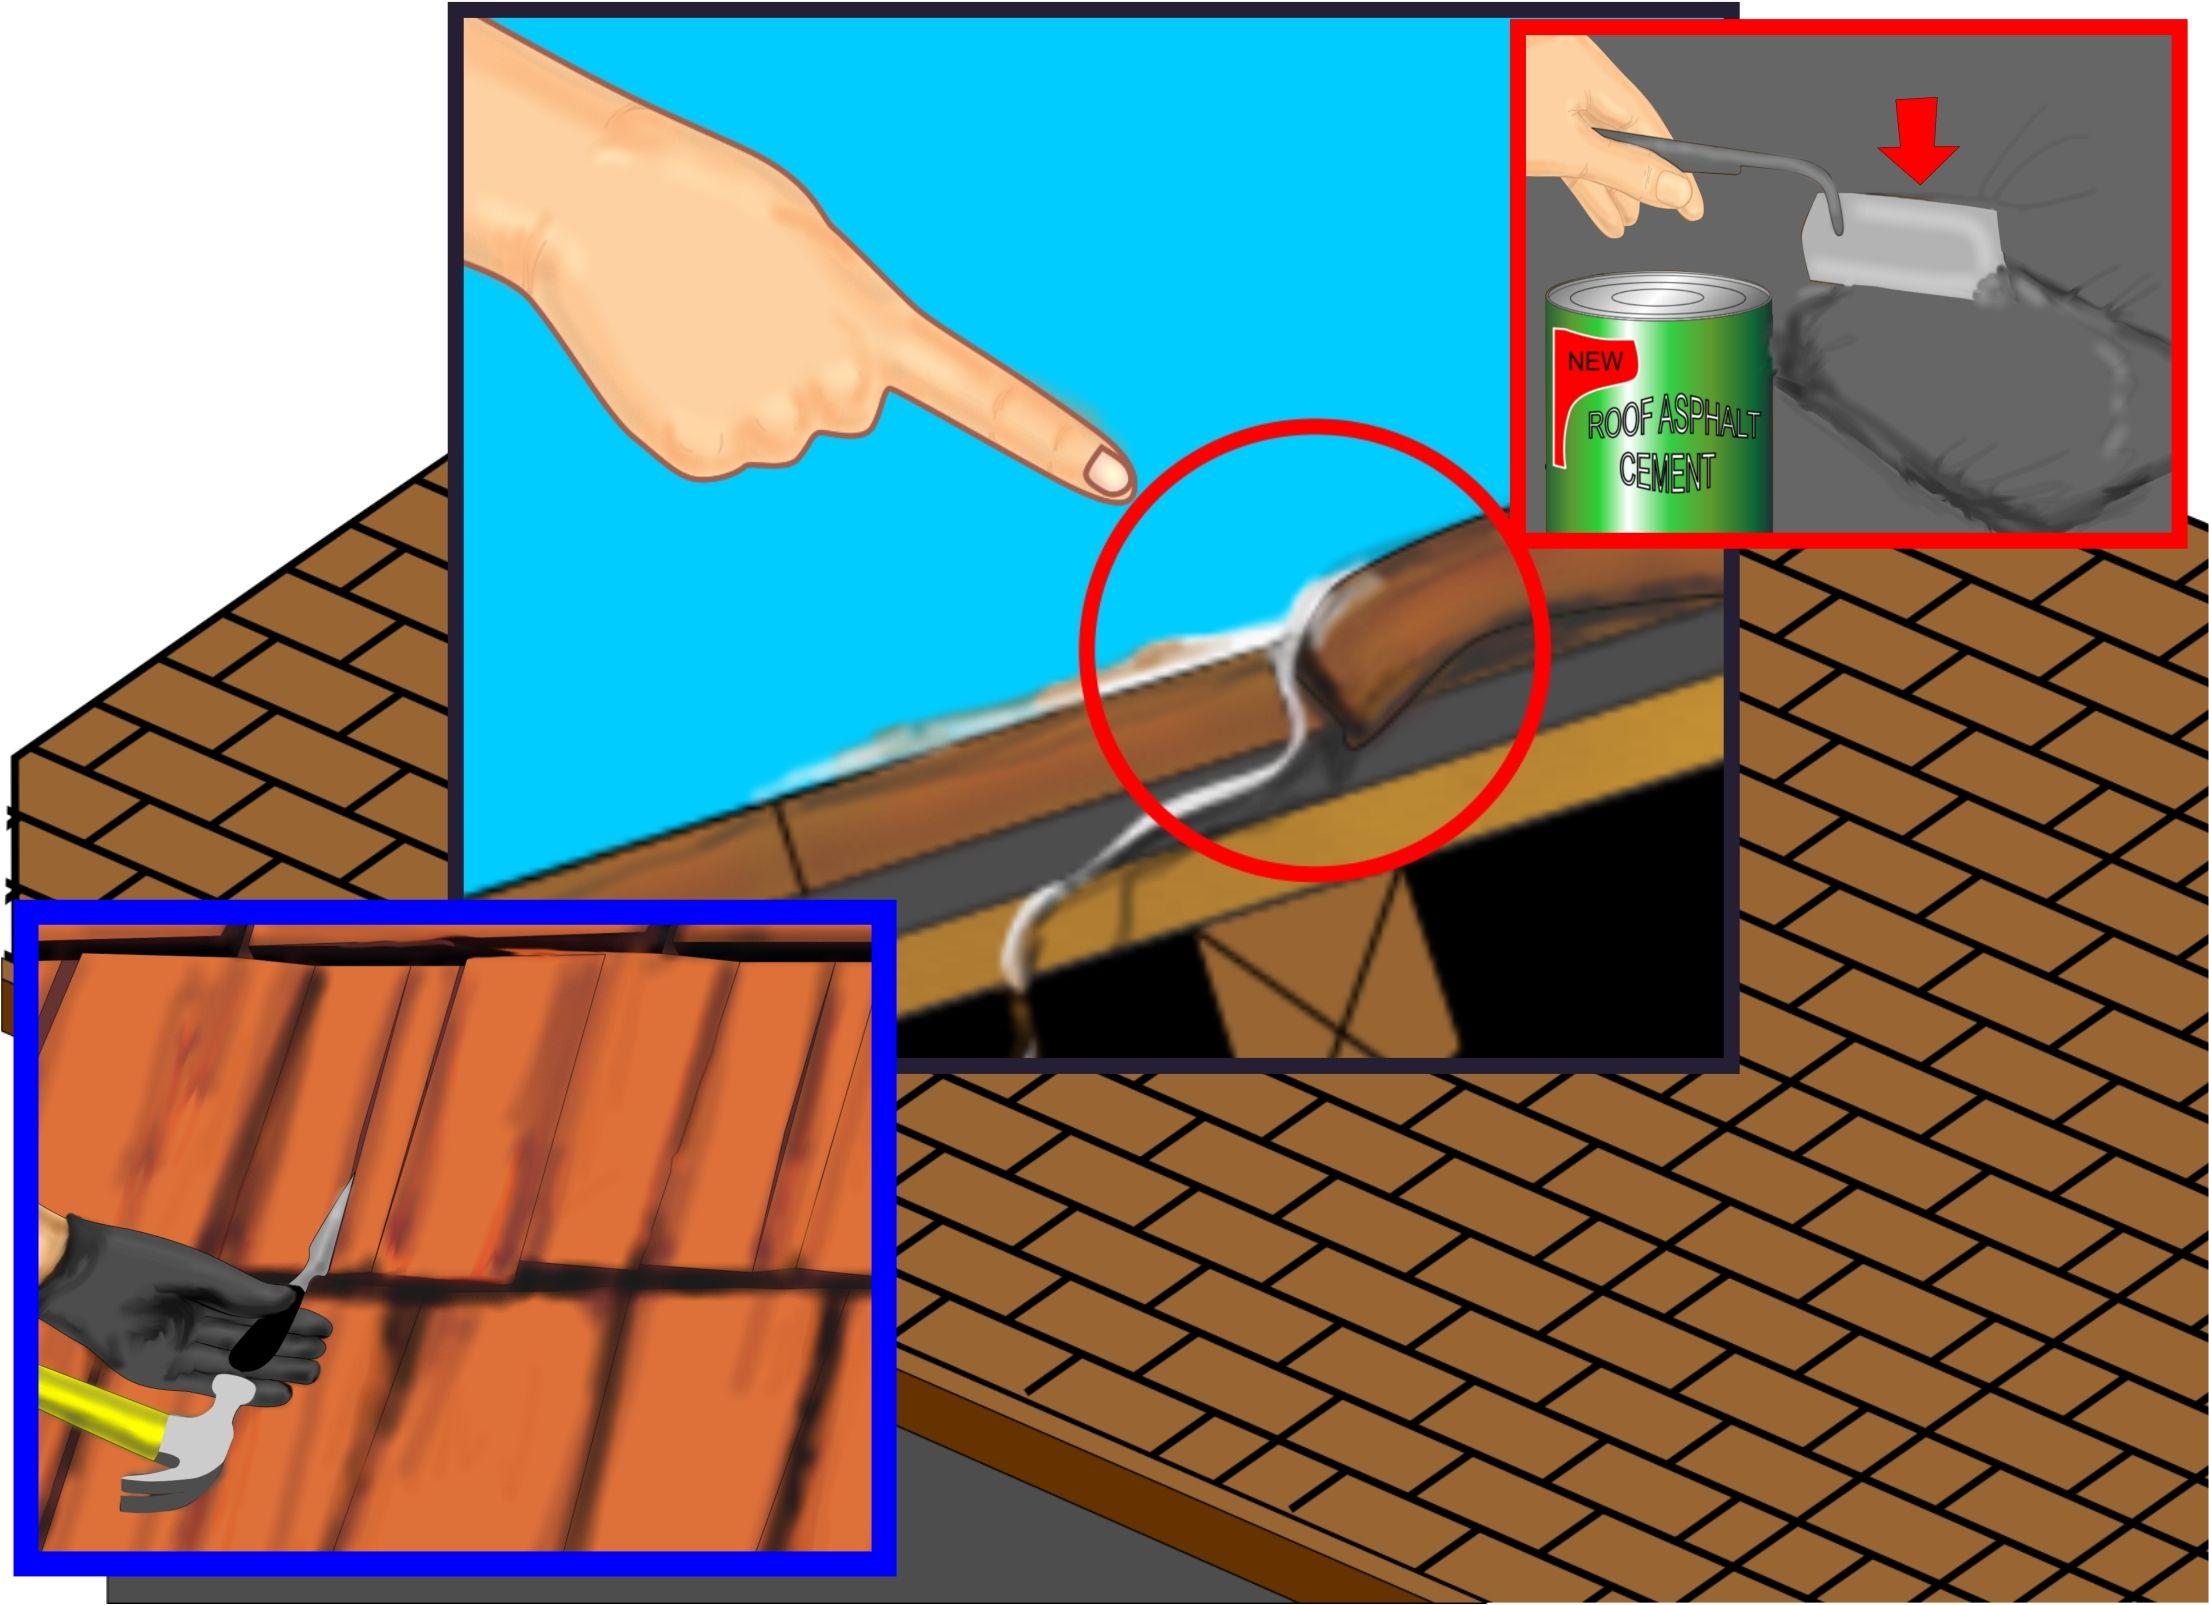 How To Repair A Leaking Roof Leaking Roof Roof Repair Diy Roof Repair